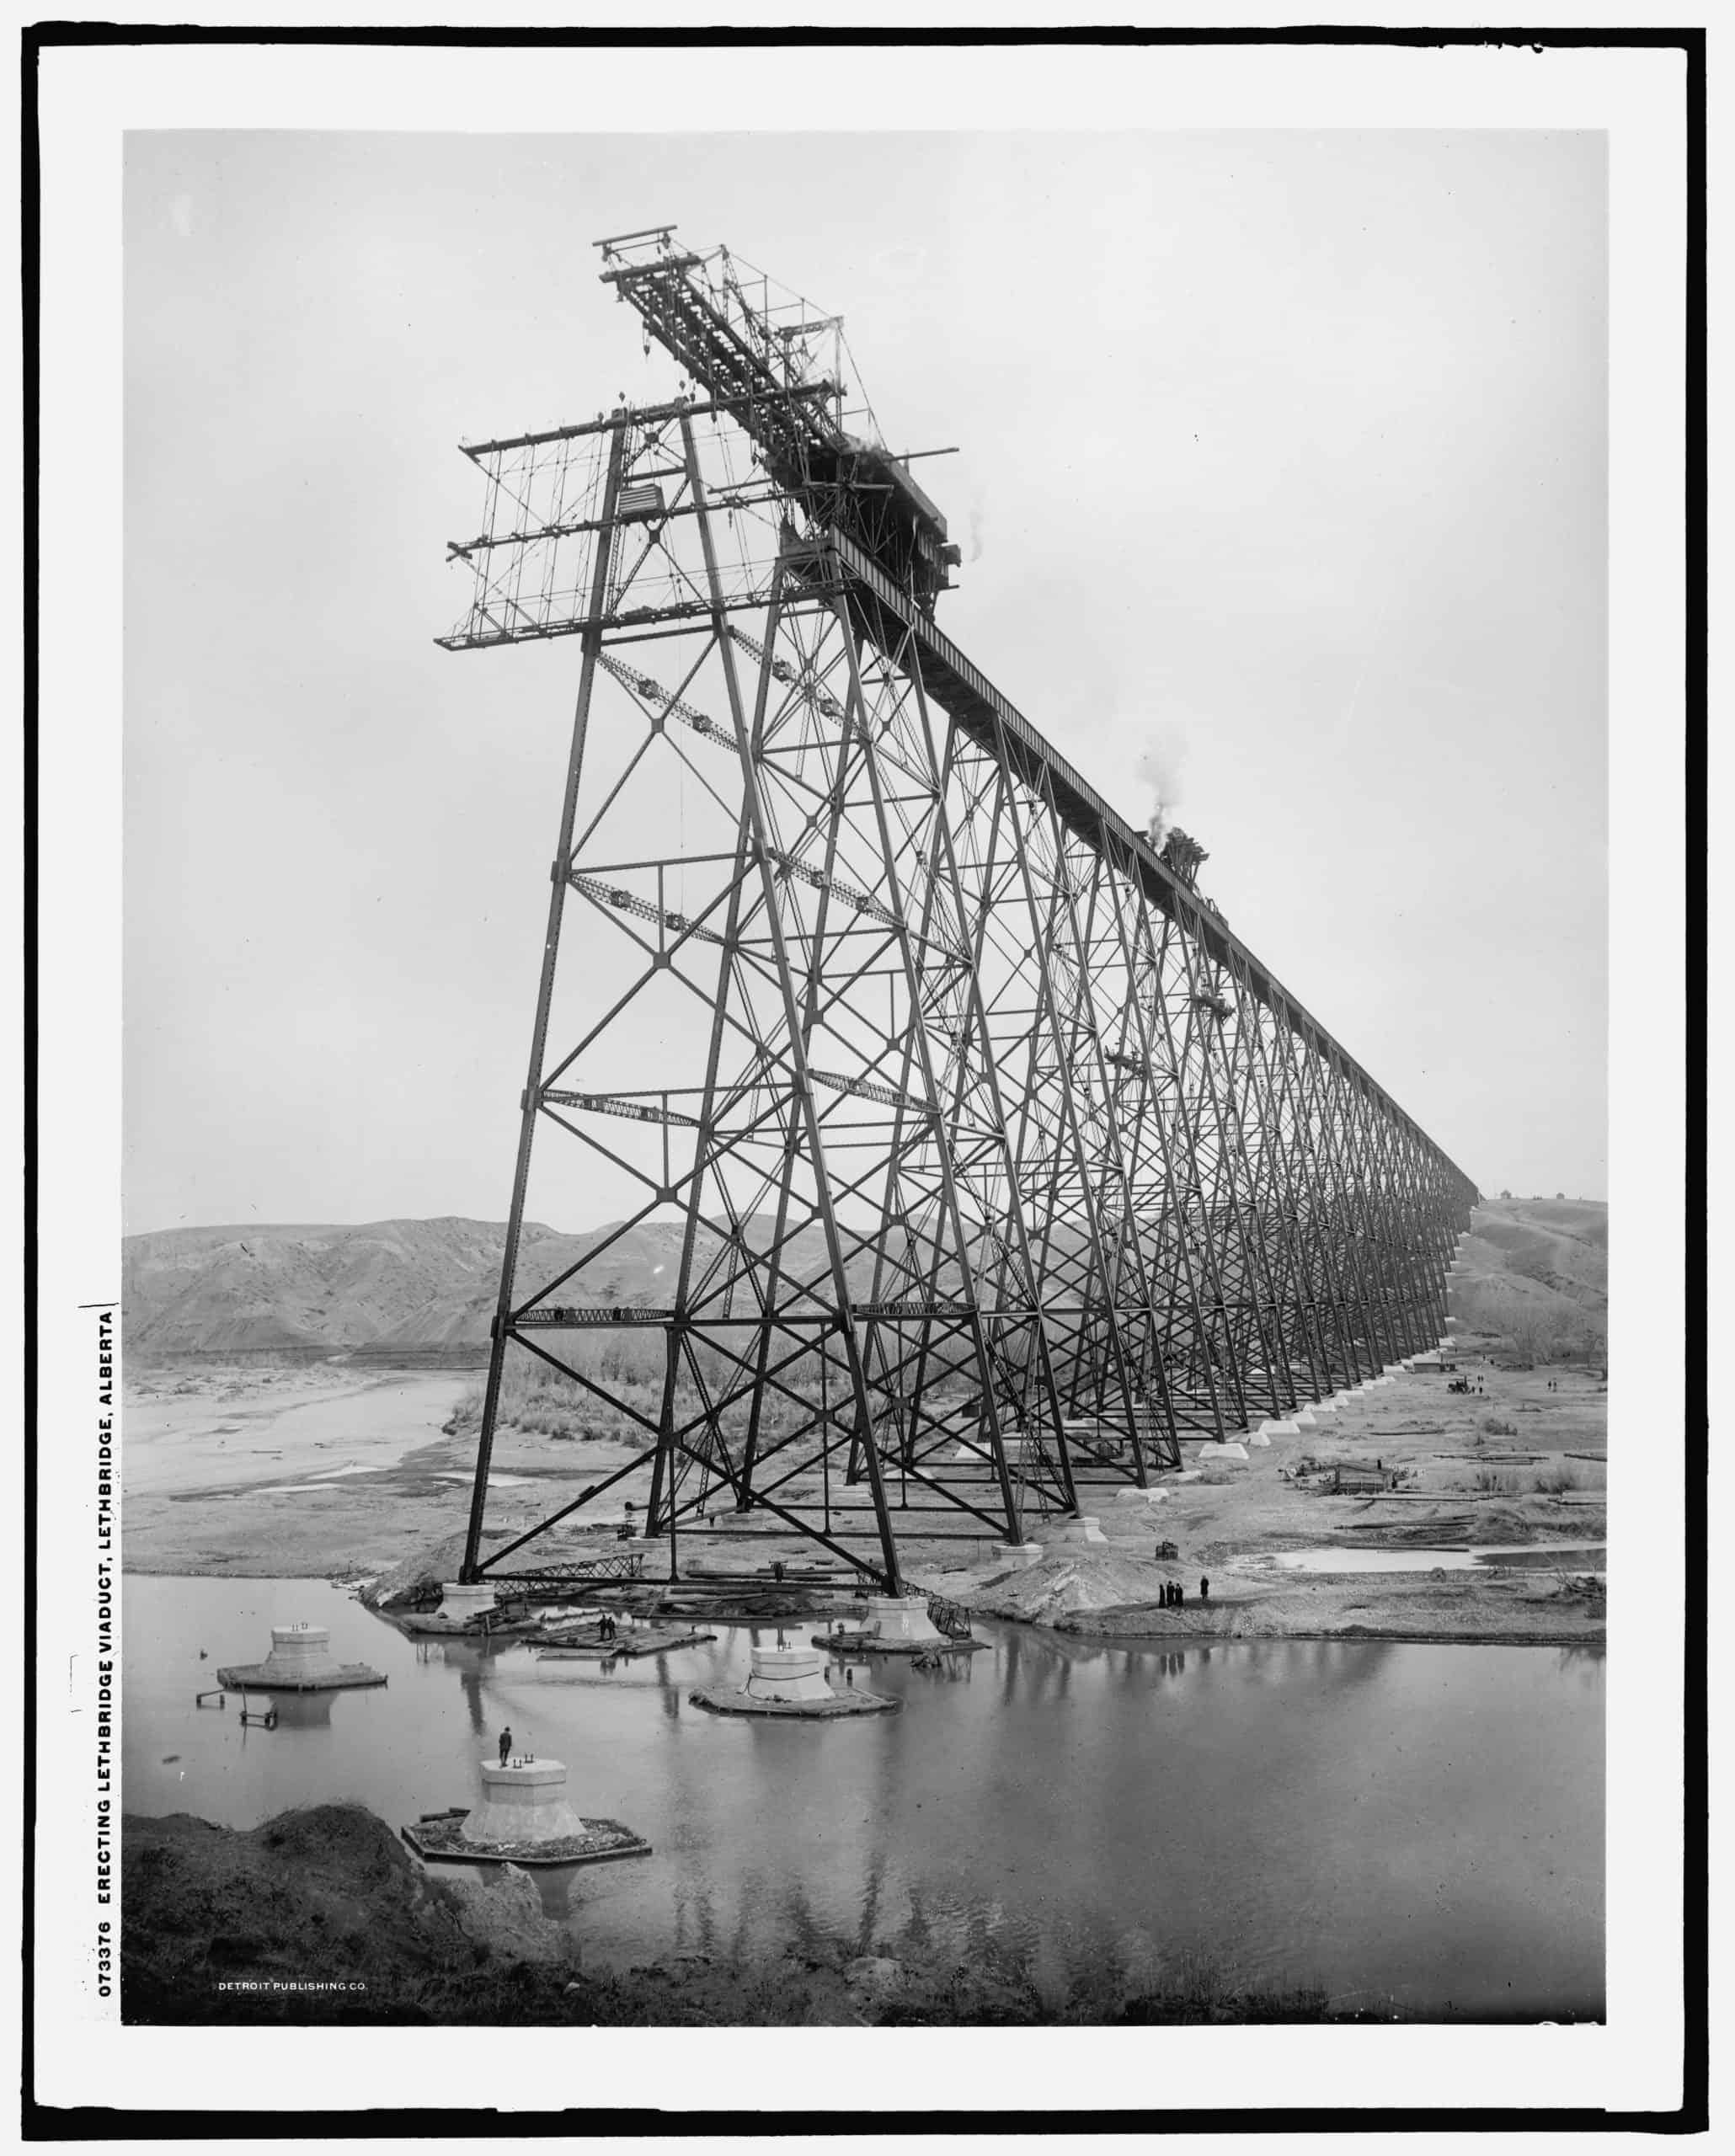 Erecting Lethbridge viaduct, Lethbridge, Alberta, Detroit Publishing Co., between 1907 and 1909